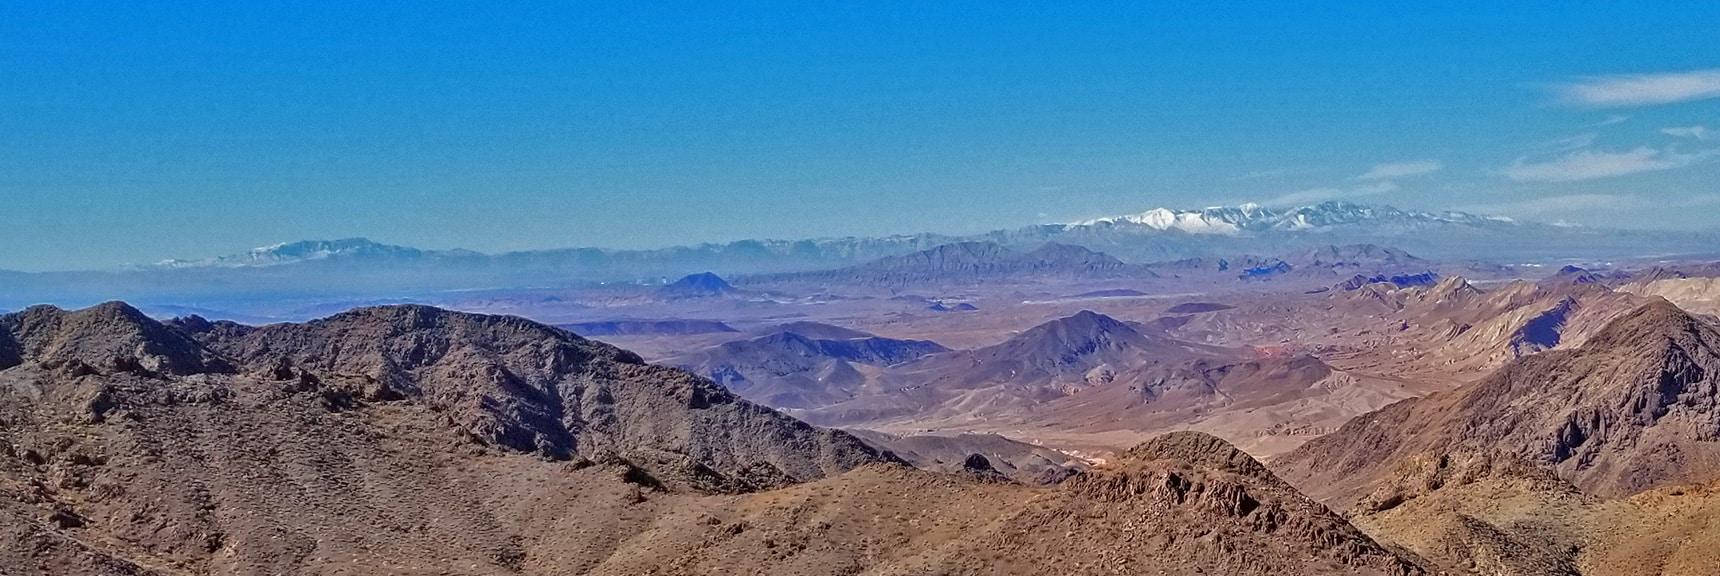 Potosi Mt, Rainbow Mts., Frenchman Mt., La Madre Mts., Mt Charleston Wilderness | Hamblin Mountain, Lake Mead National Conservation Area, Nevada